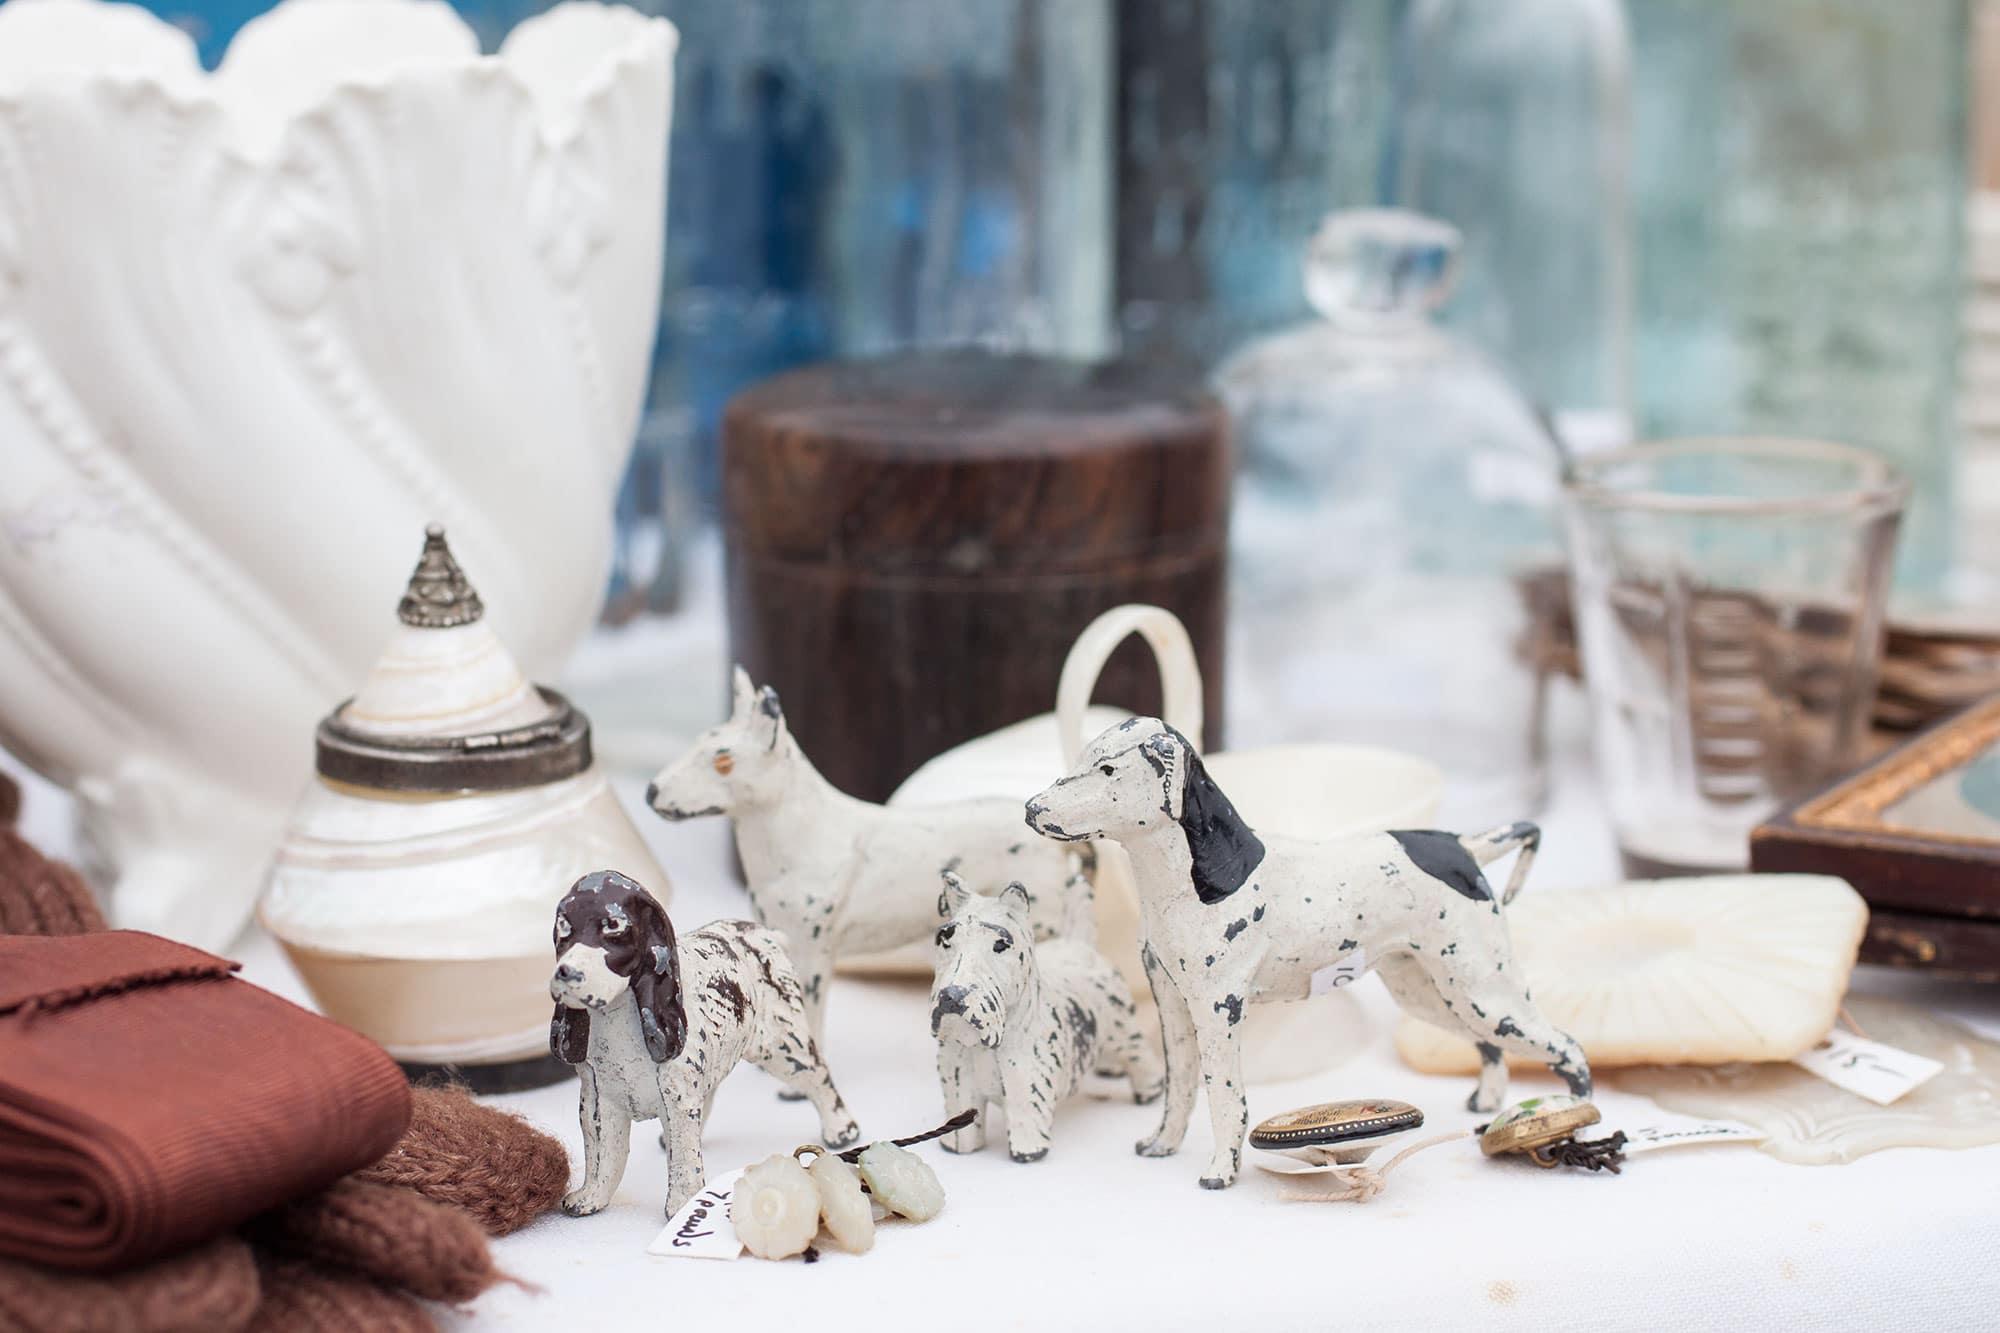 Malvern flea market vintage and antiques